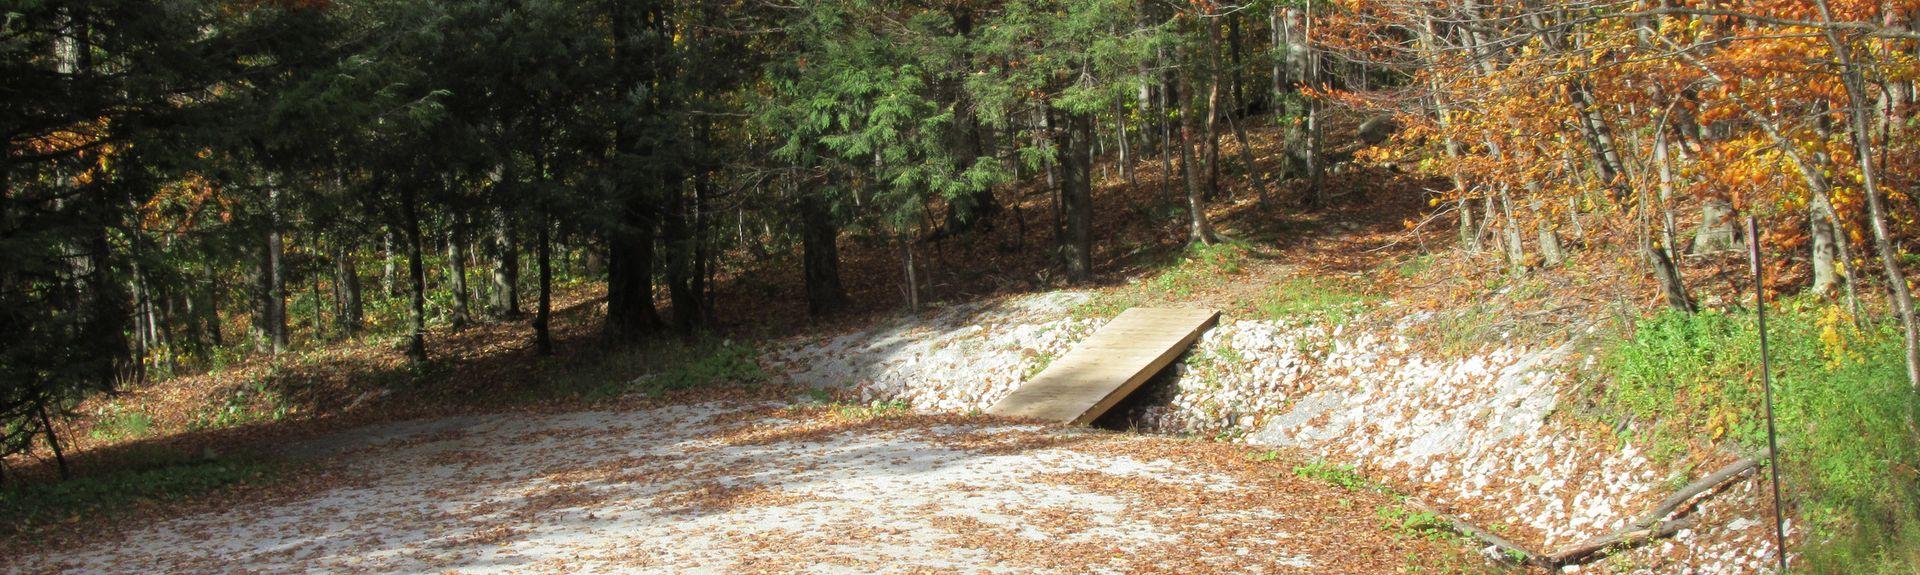 Gifford Woods State Park, Killington, Vermont, USA